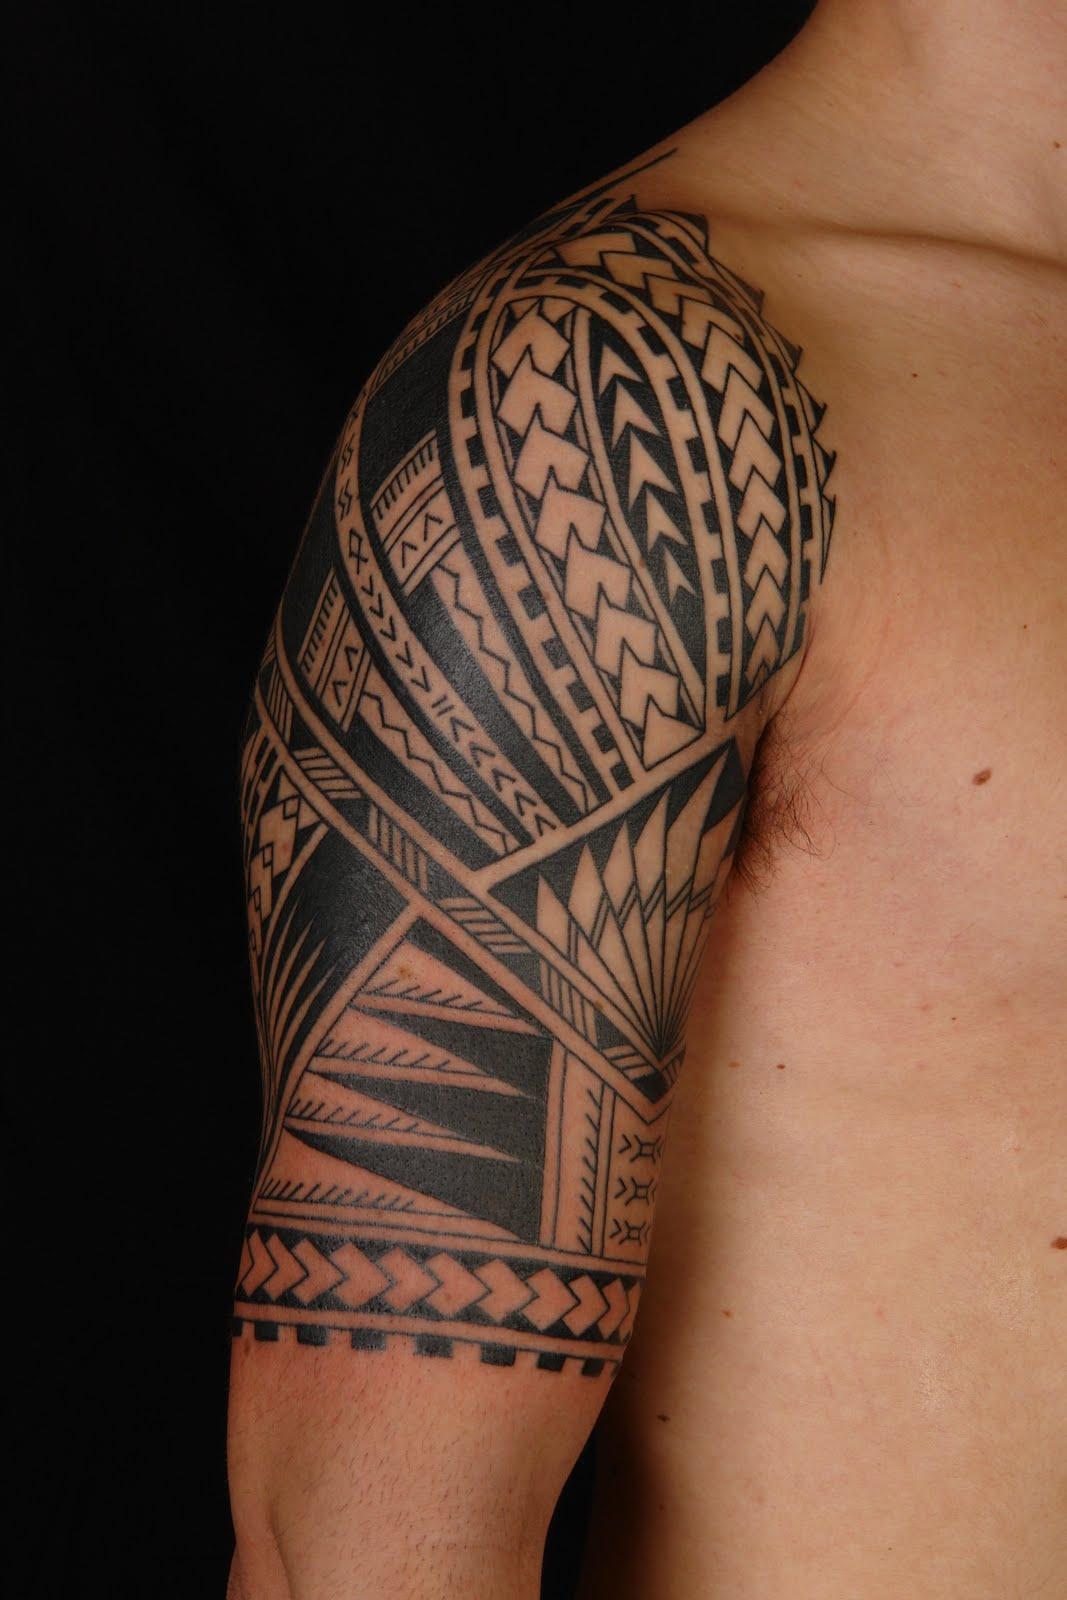 African Tribal Tattoo Half Sleeve: Maori Polynesian Half Sleeve Tattoo Ideas